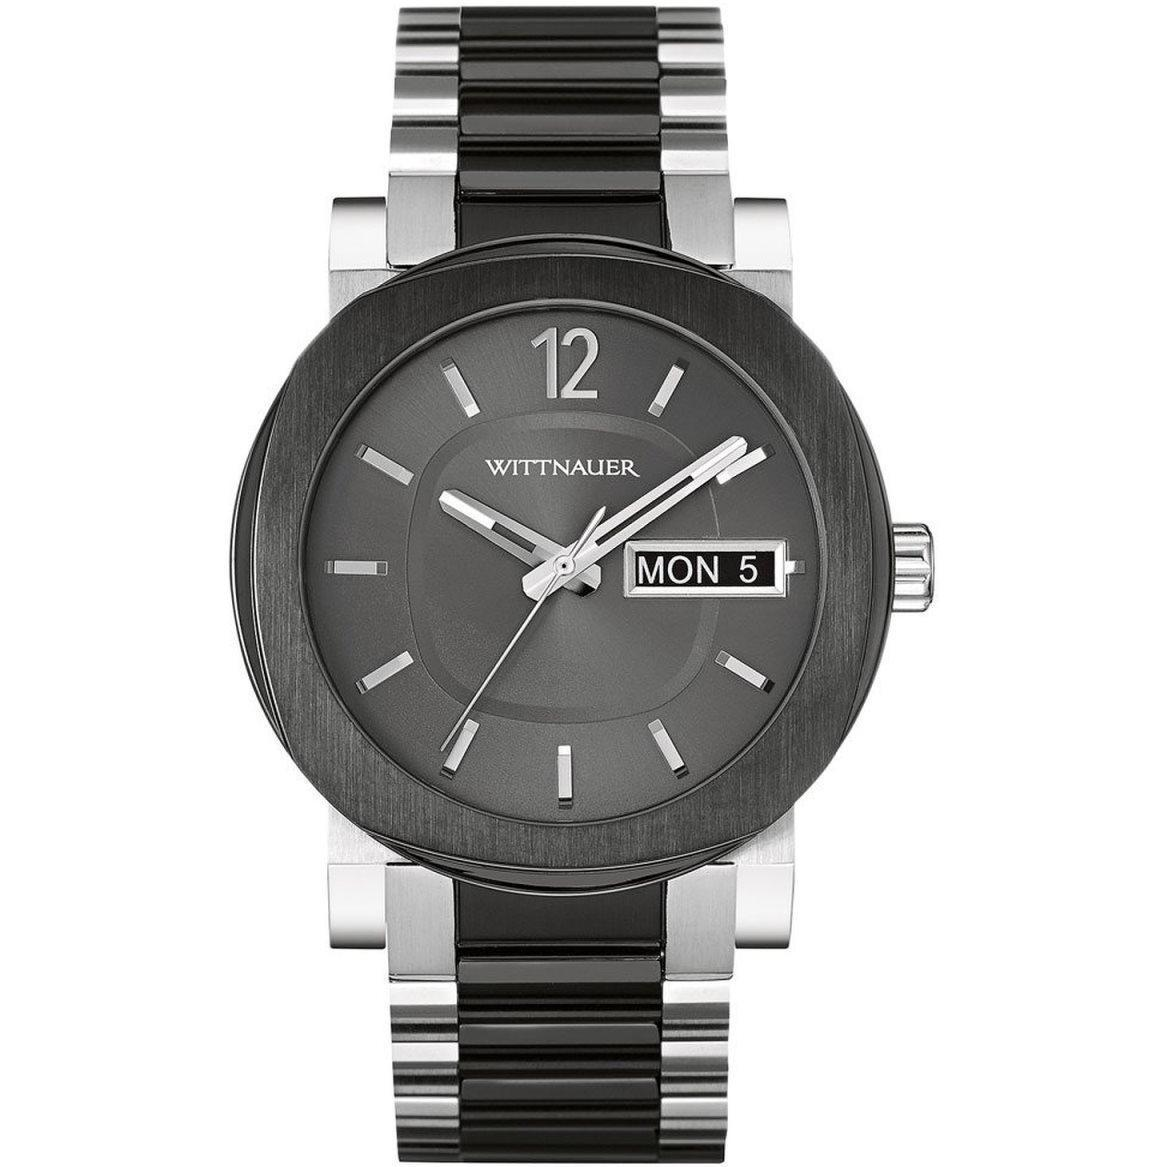 Lacoste Wittnauer Men's Aiden Two-tone Watch (Watch), Bla...